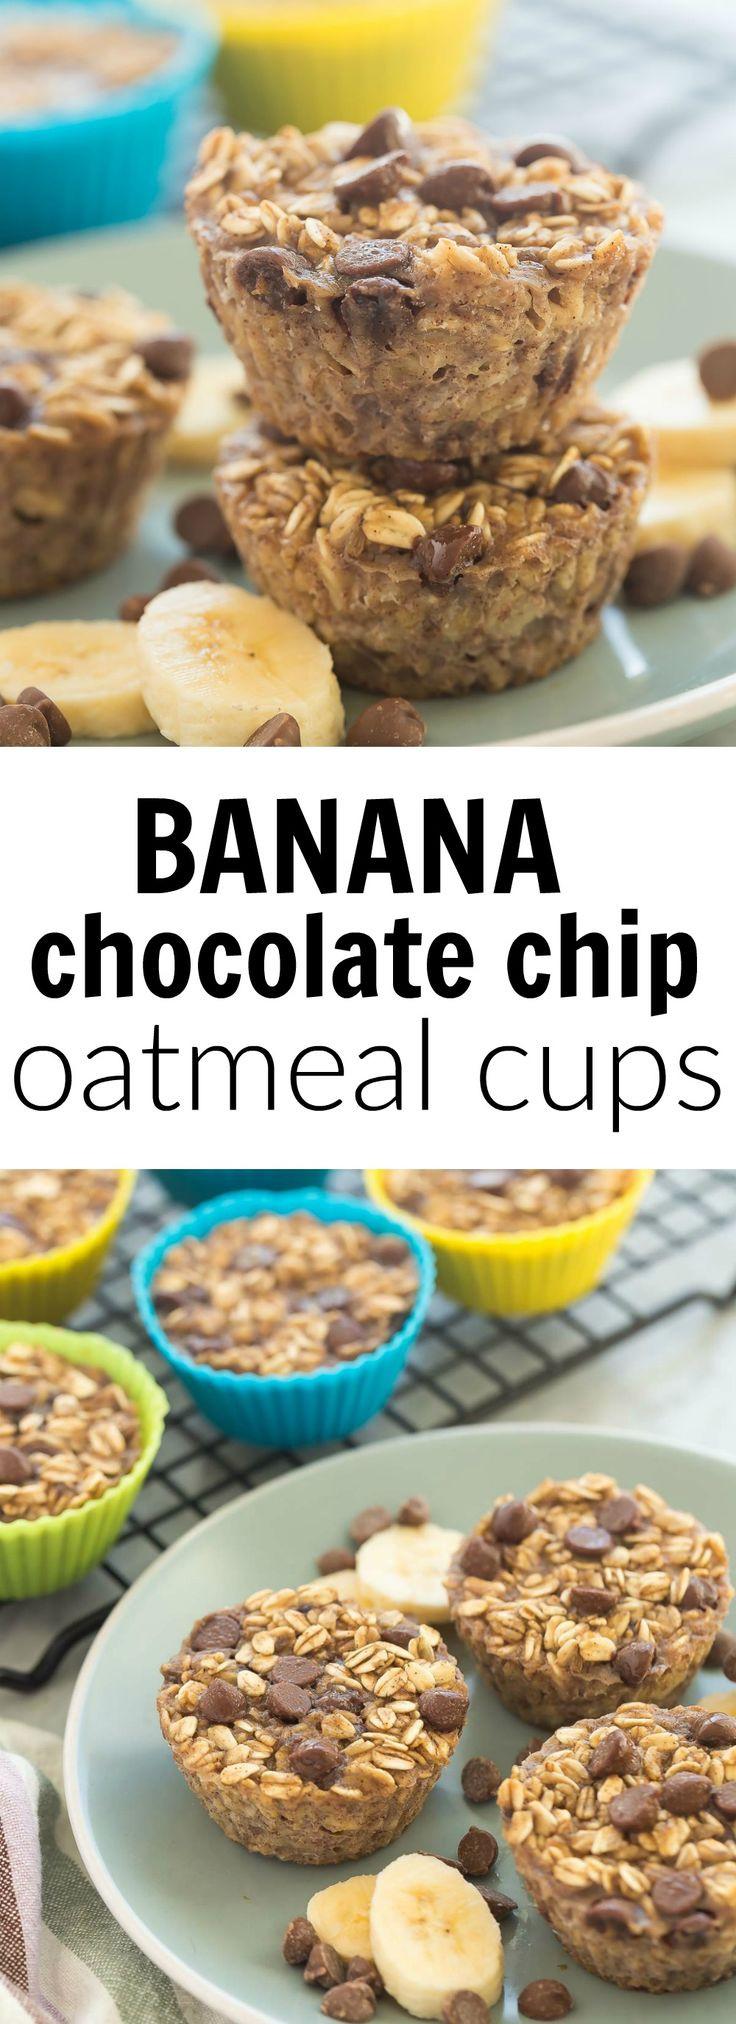 Healthy Breakfast Muffins Low Calorie  Best 25 Low calorie breakfast ideas on Pinterest